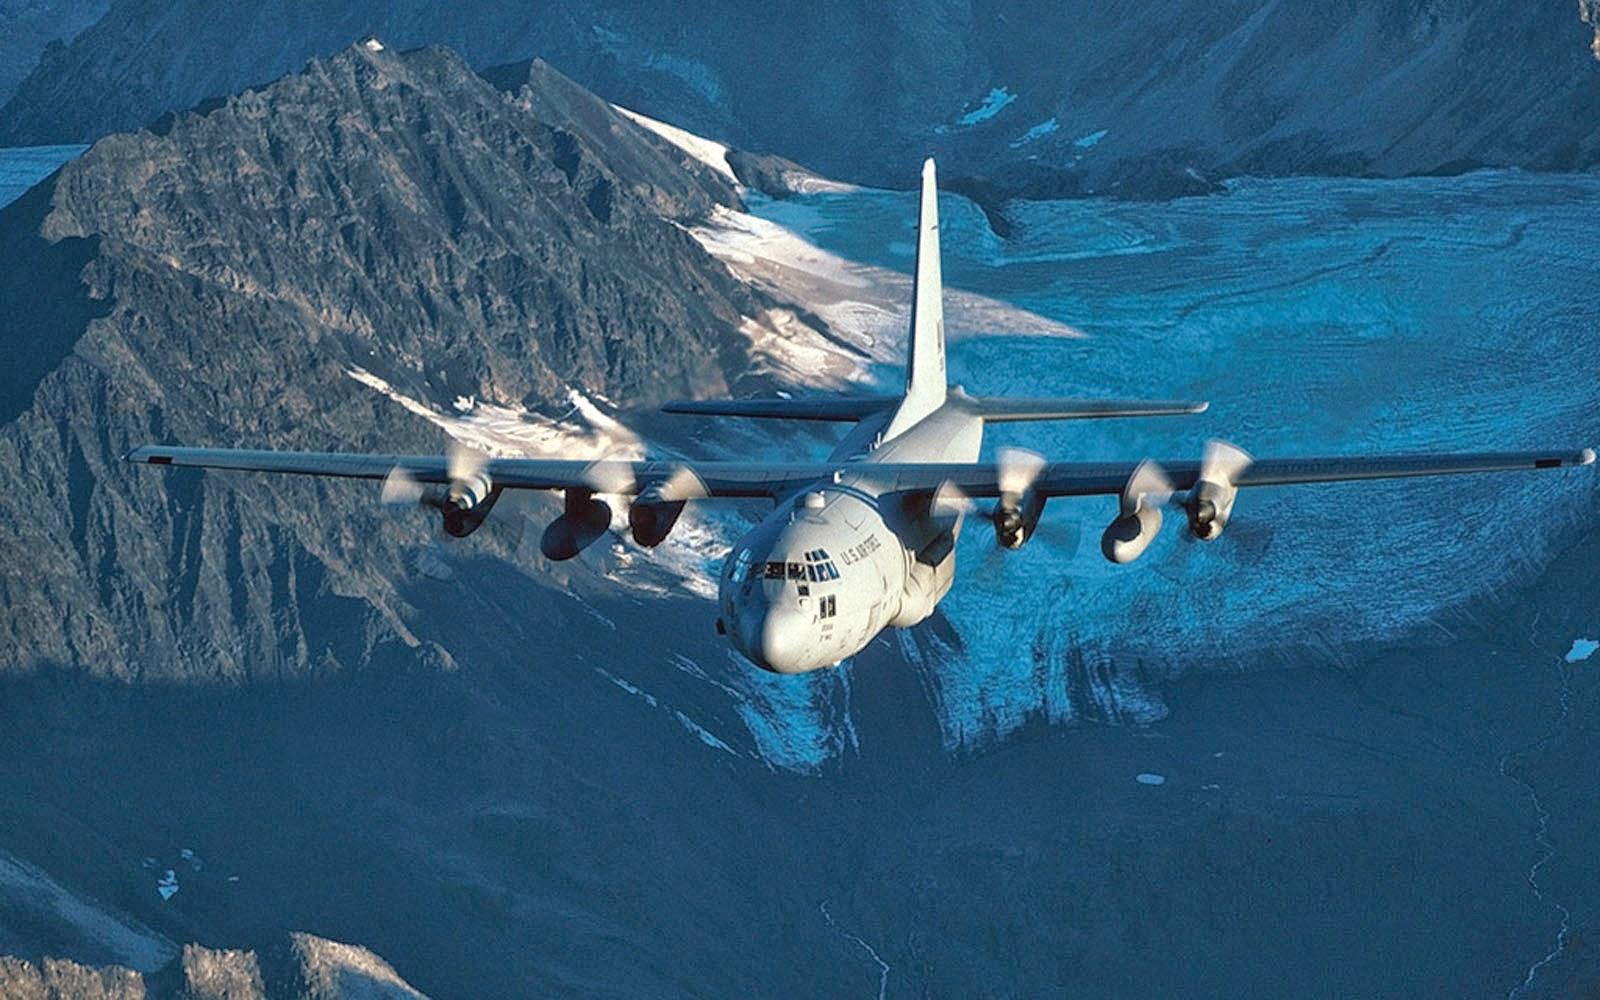 Cute Roses Wallpapers For Laptop Wallpapers Lockheed C 130 Hercules Wallpapers